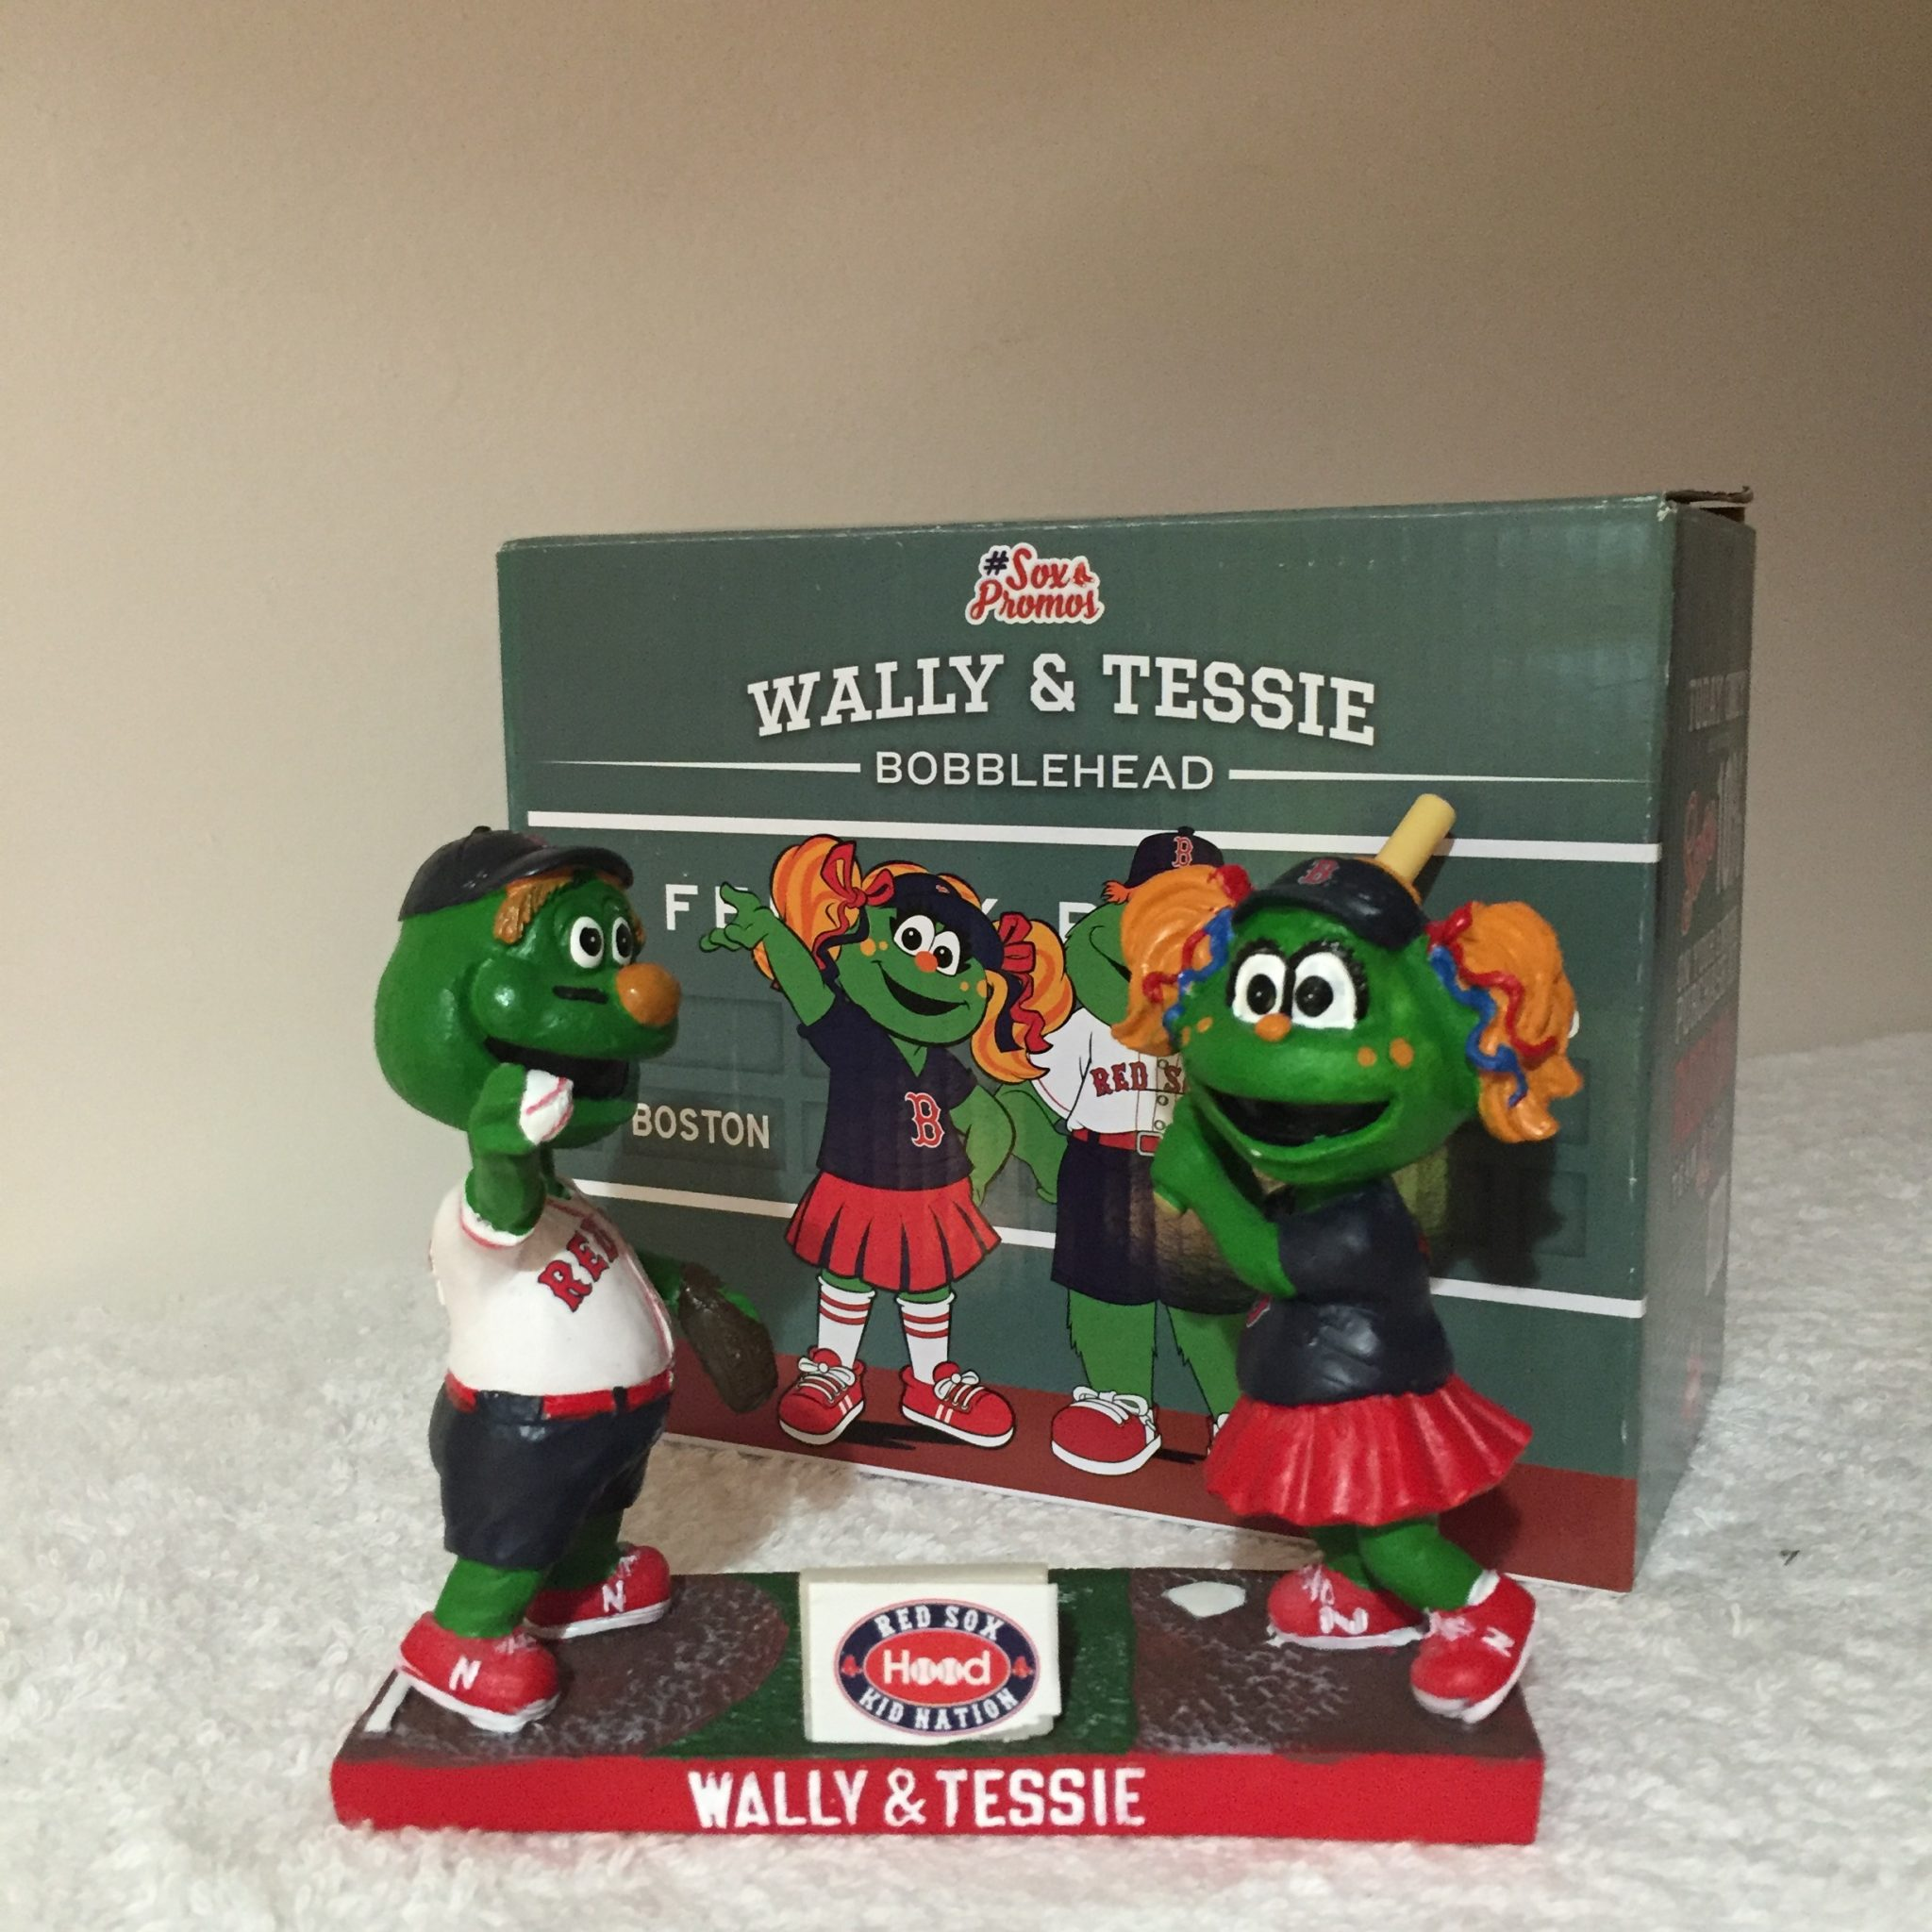 Wally & Tessie